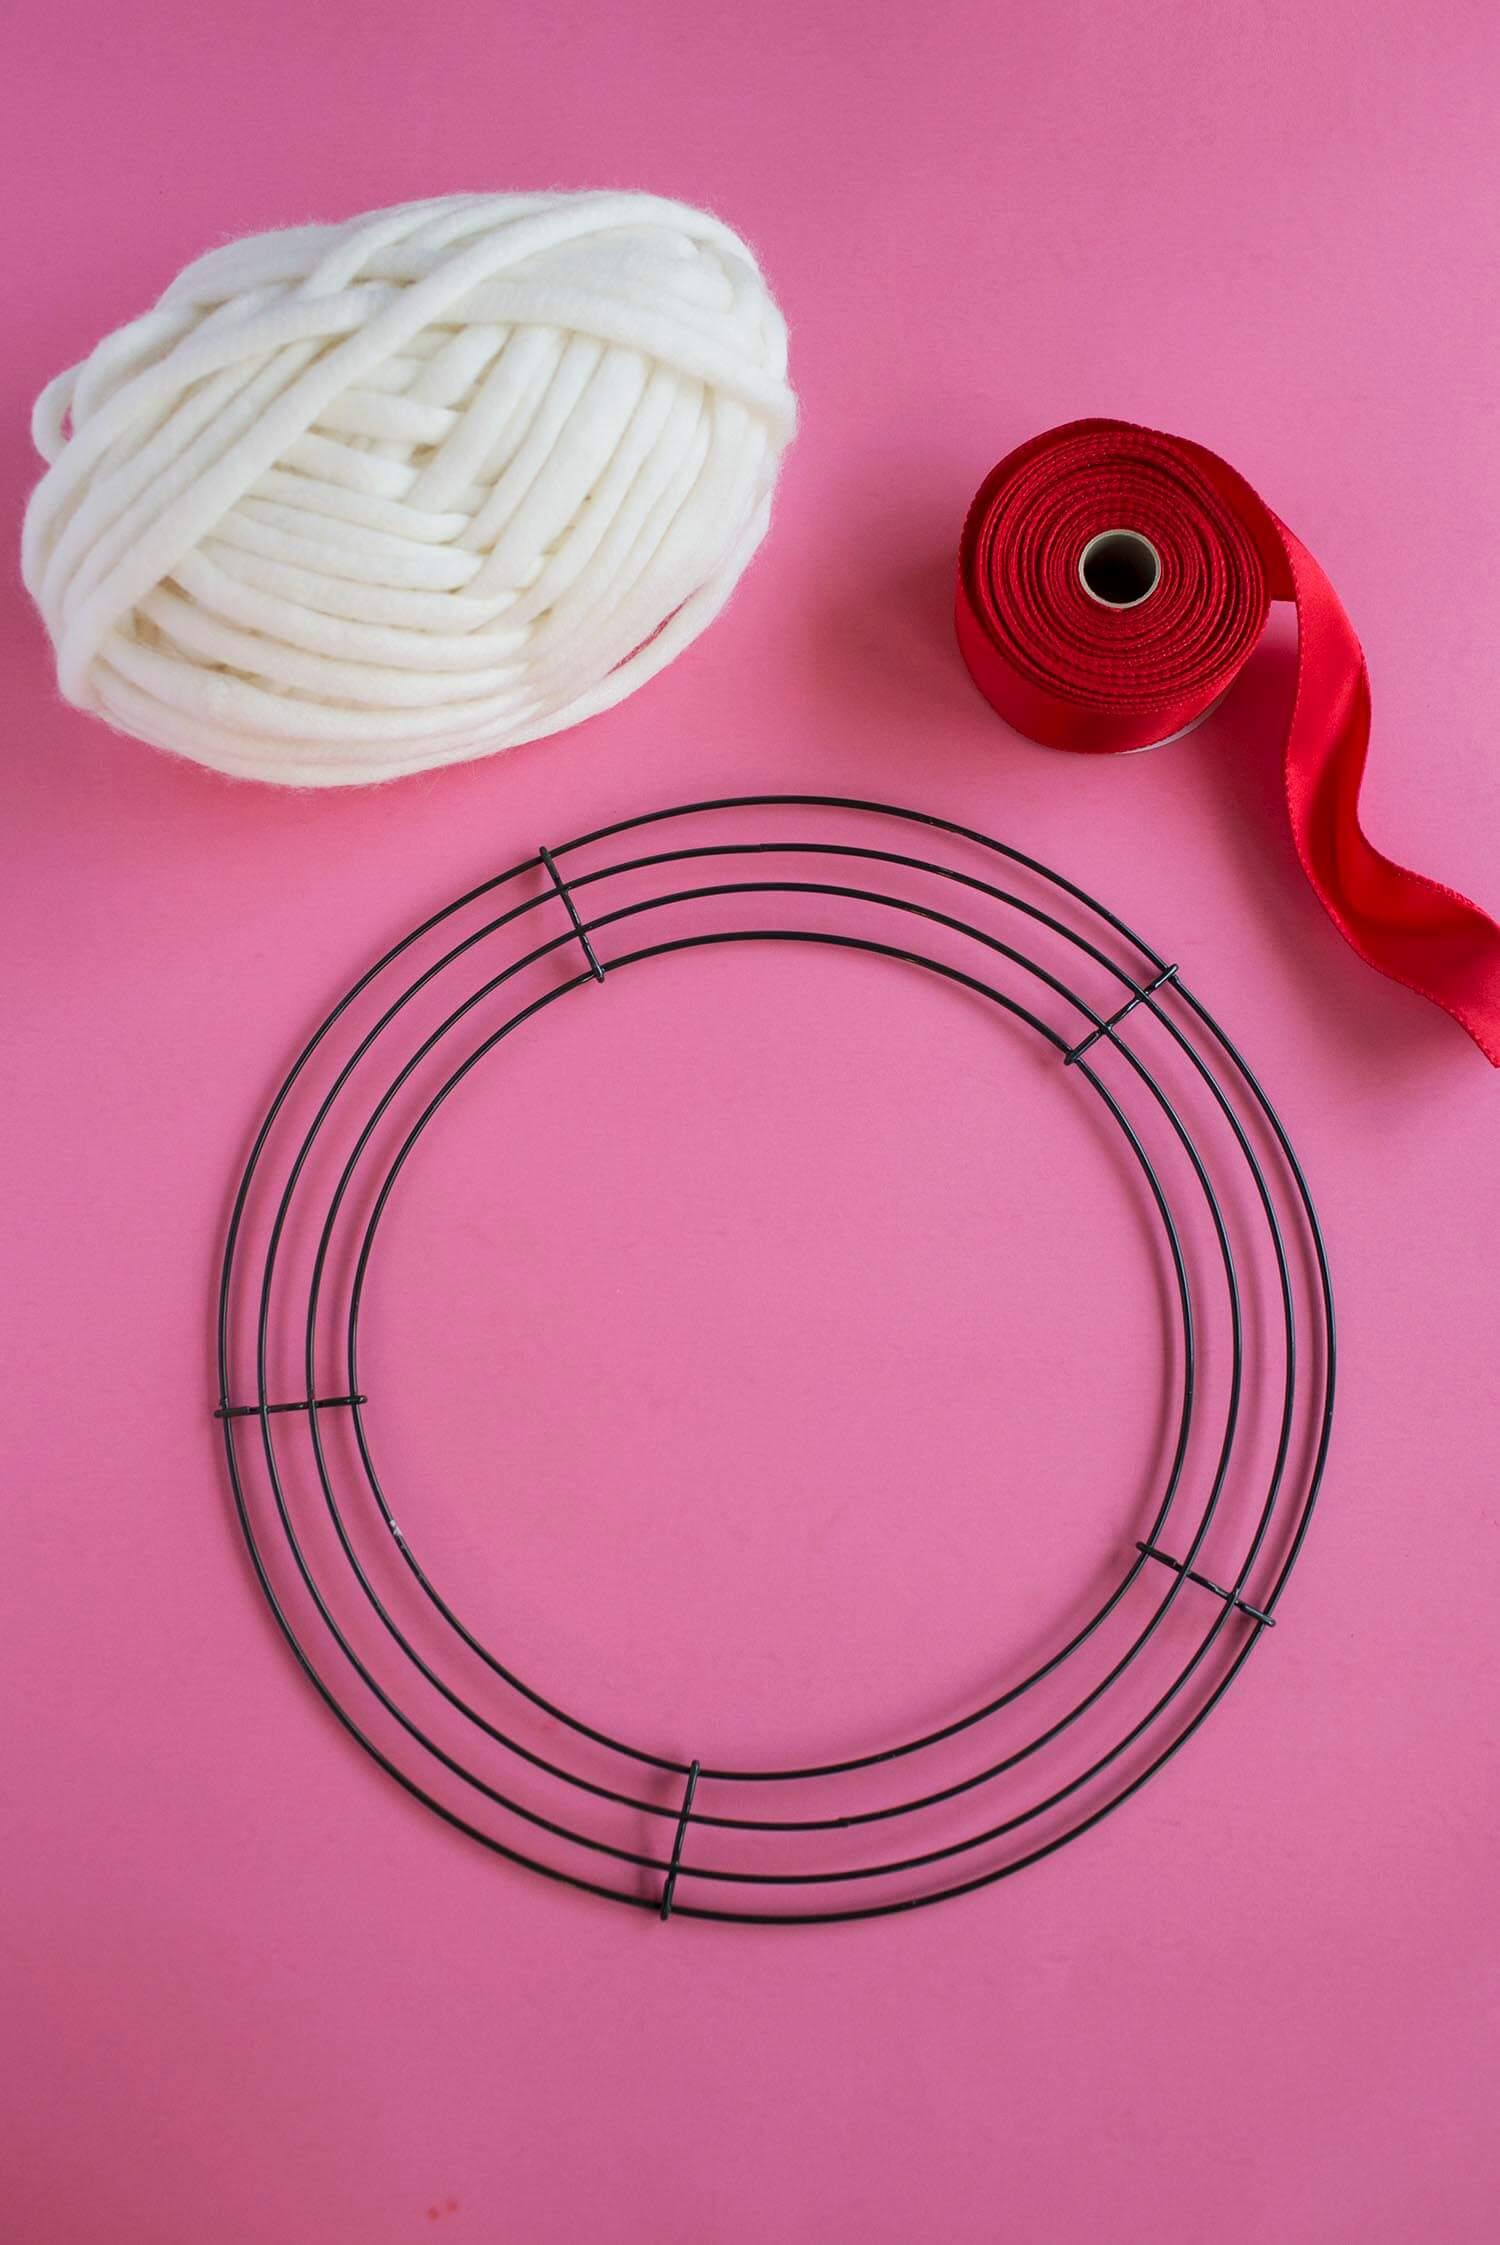 How to make a yarn wreath